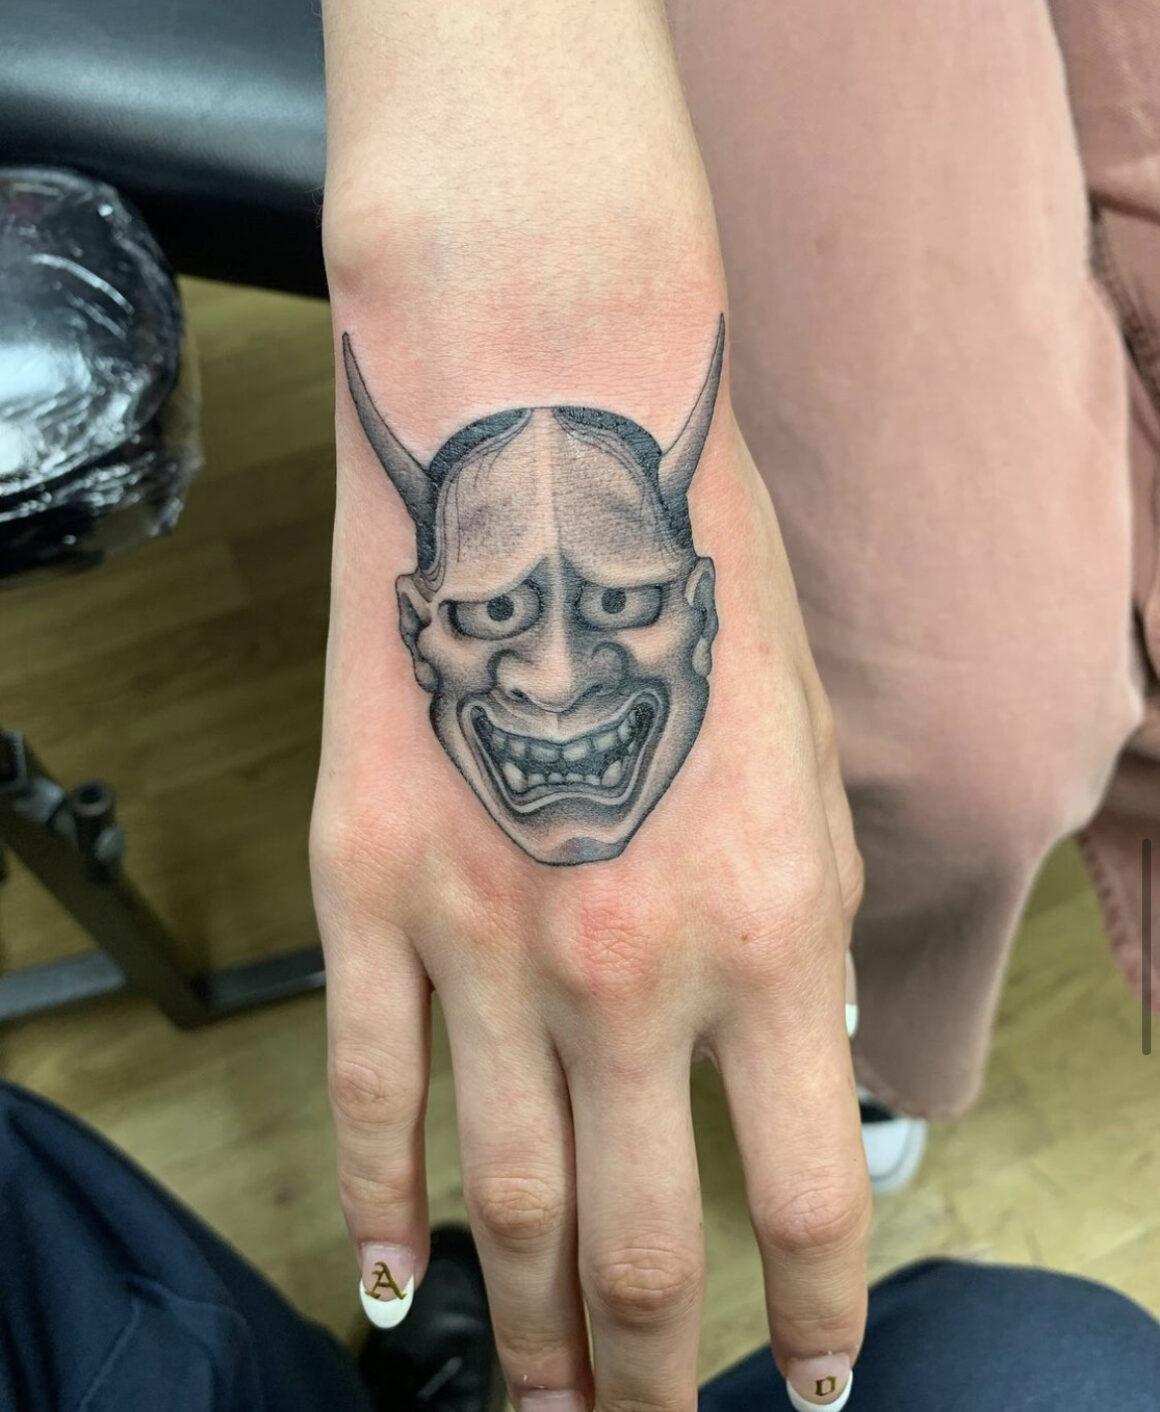 Oliver Macintosh, Frith Street Tattoo, London, UK